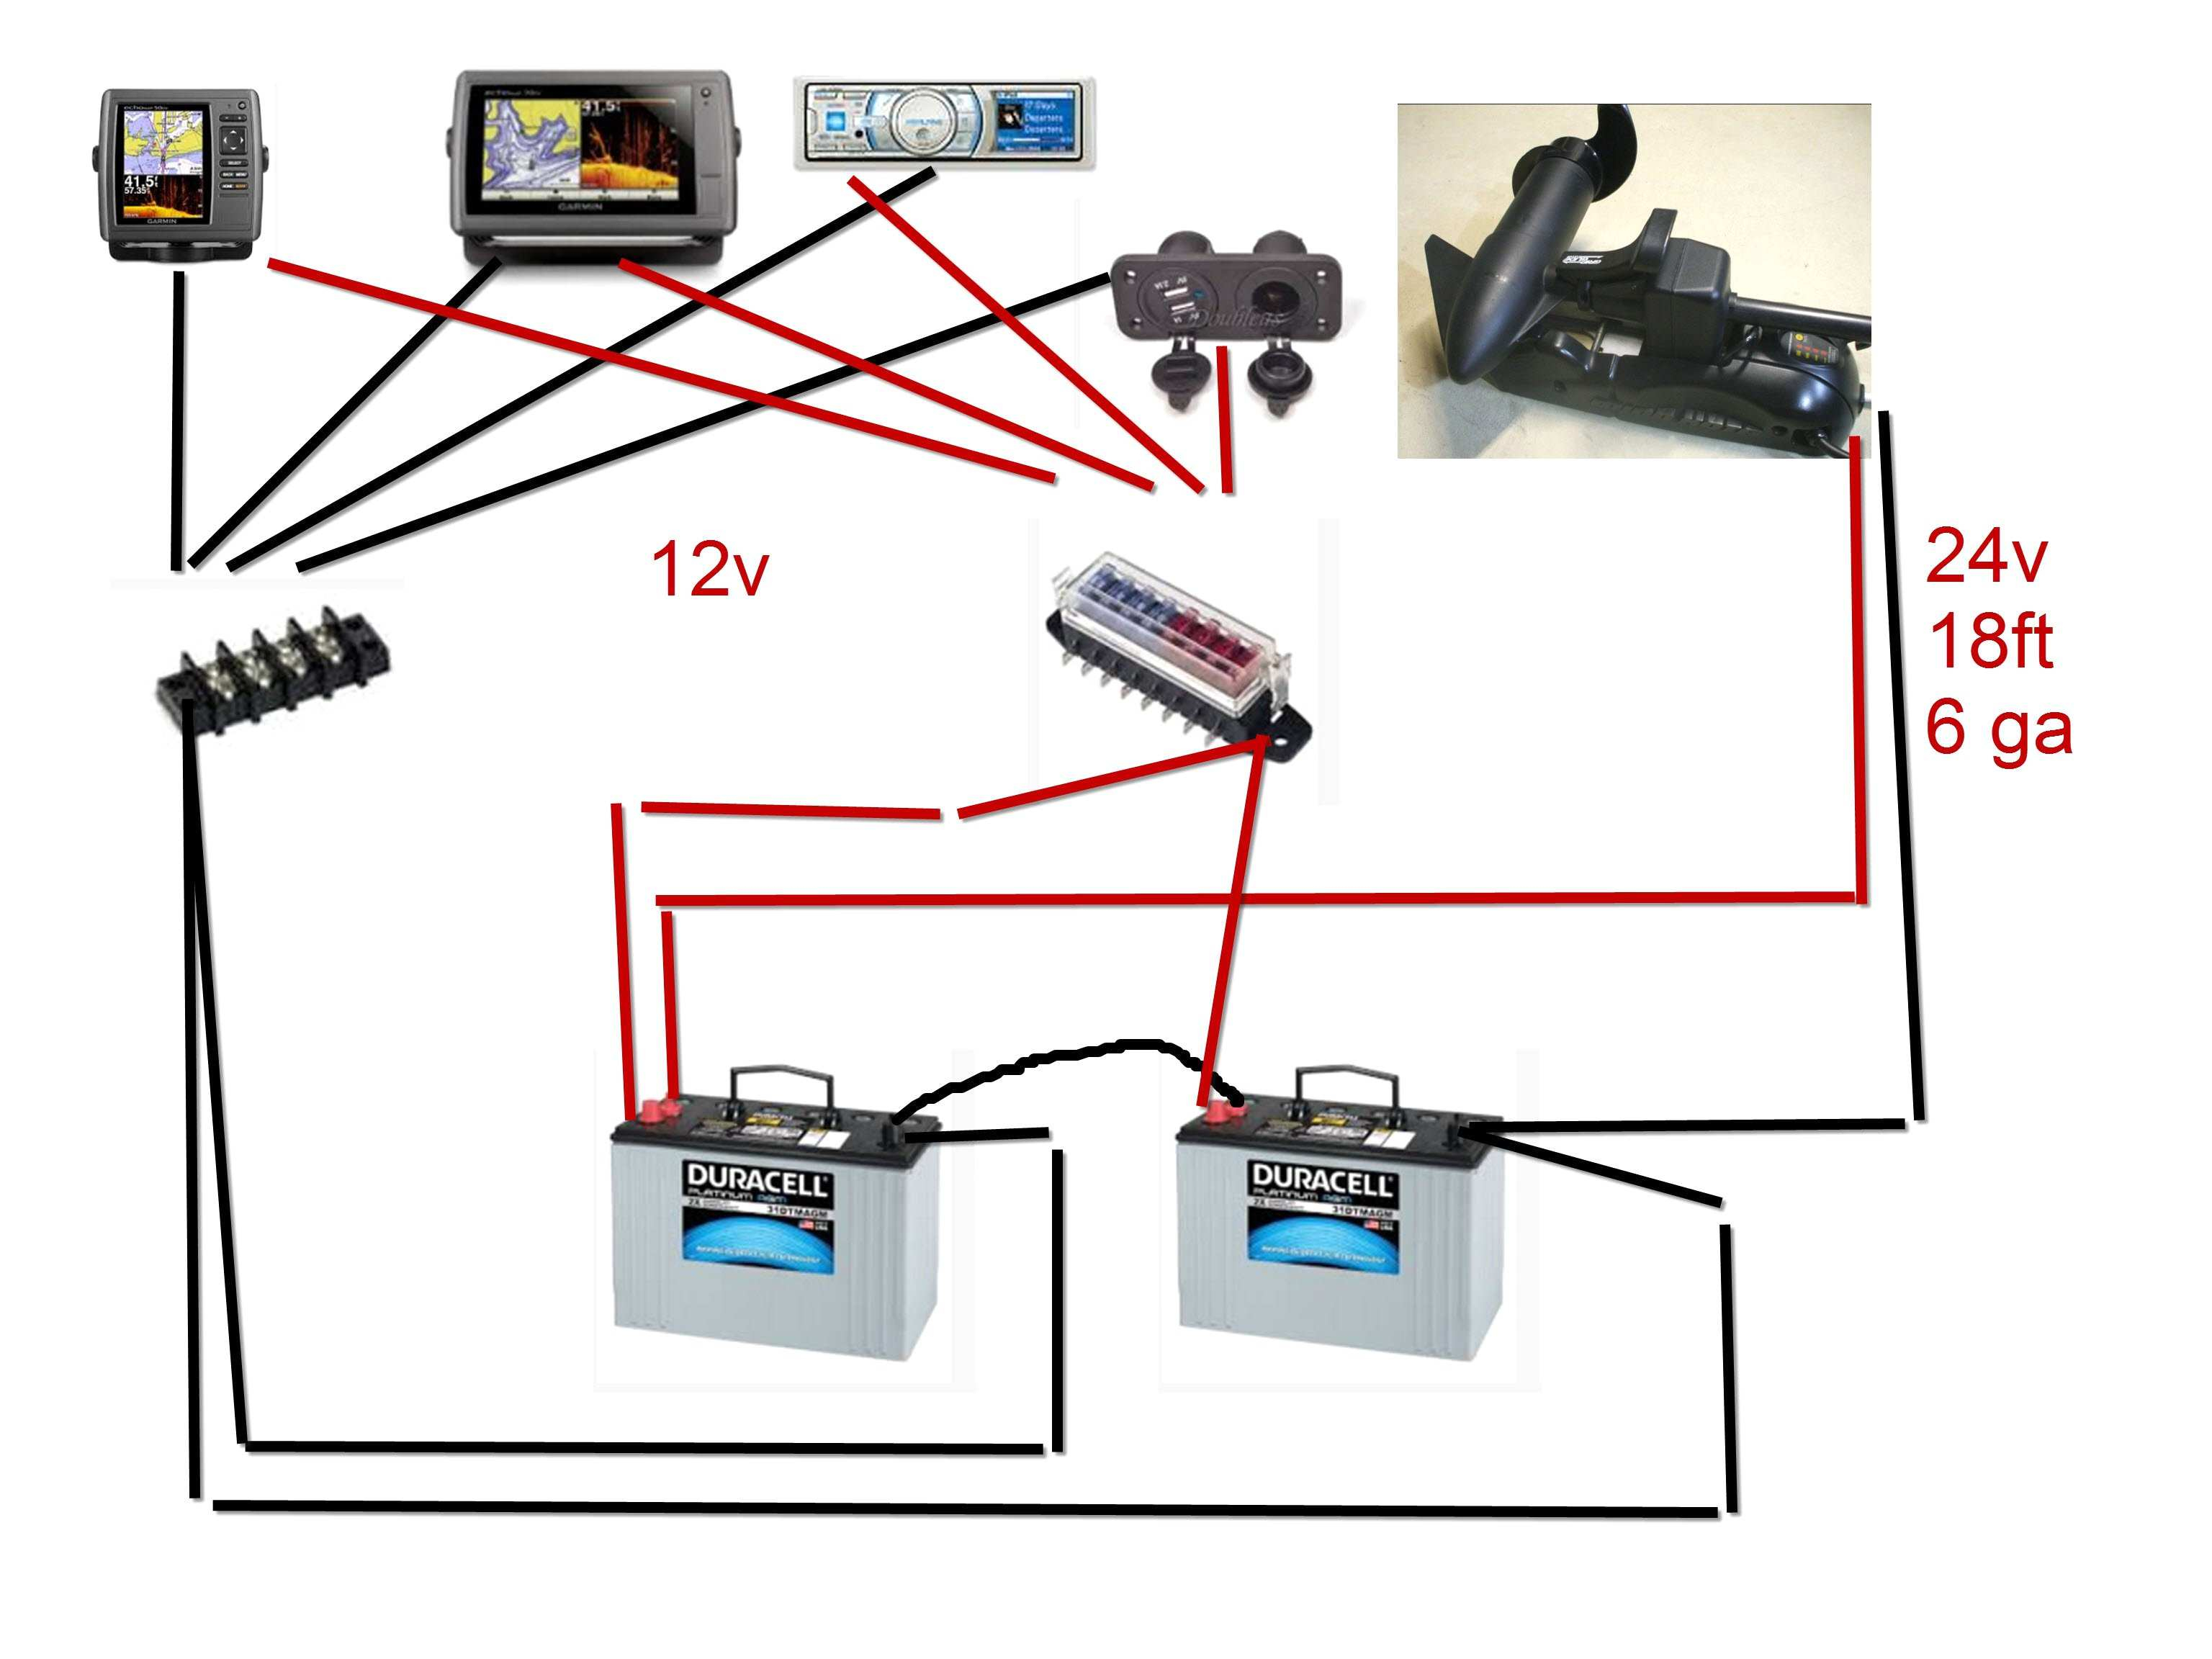 minn kota trolling motor wiring diagram Collection-12v Trolling Motor Wiring Diagram Inspirational Wiring Diagram 12v Trolling Motor Minn Kota 24 In Volt Blurts Me 18-e